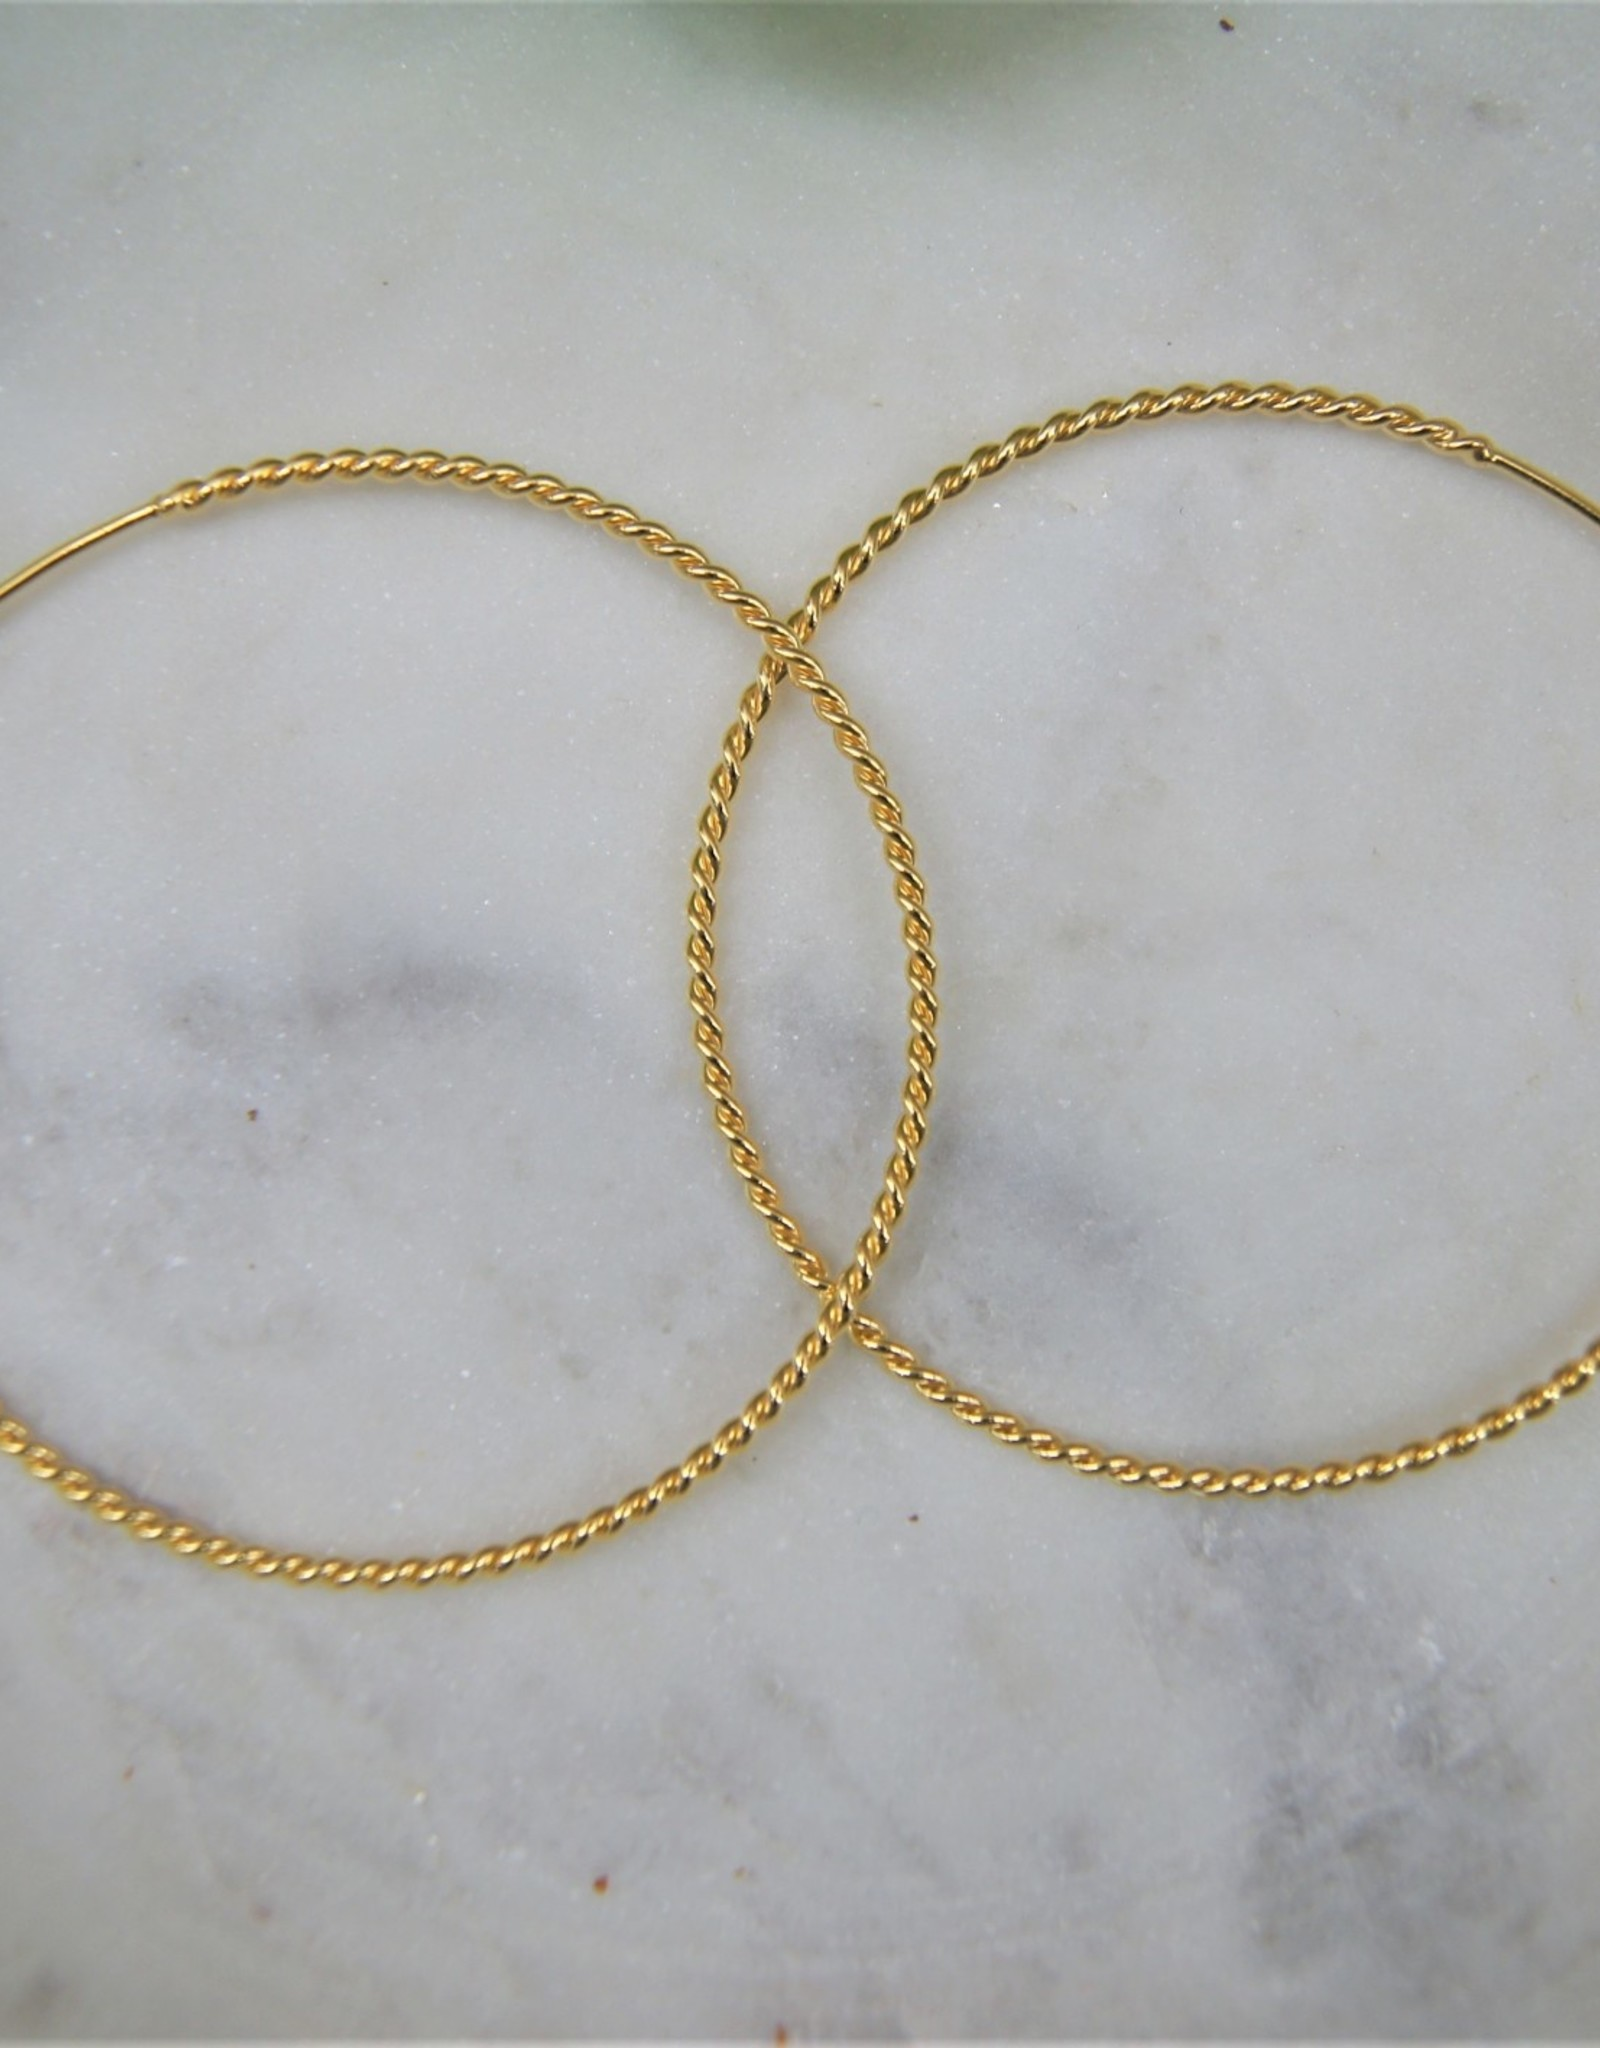 Tashi 58mm Twisted Wire Hoop Earrings - Gold Vermeil